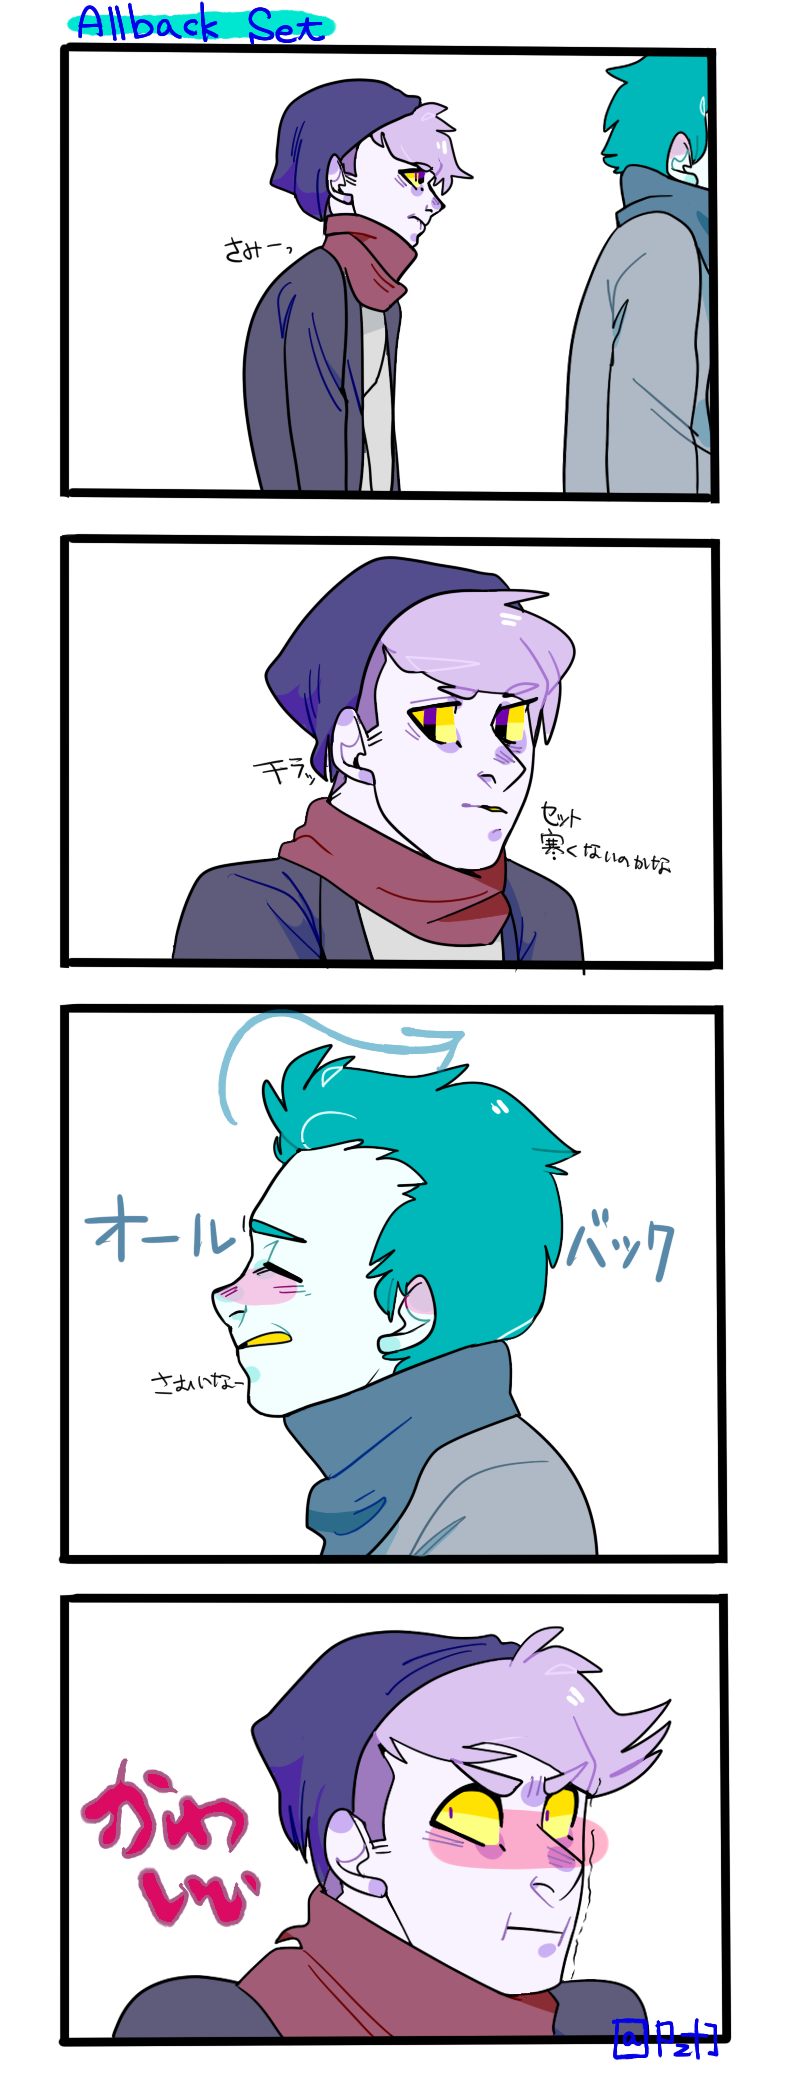 Twins comic by Tinypop